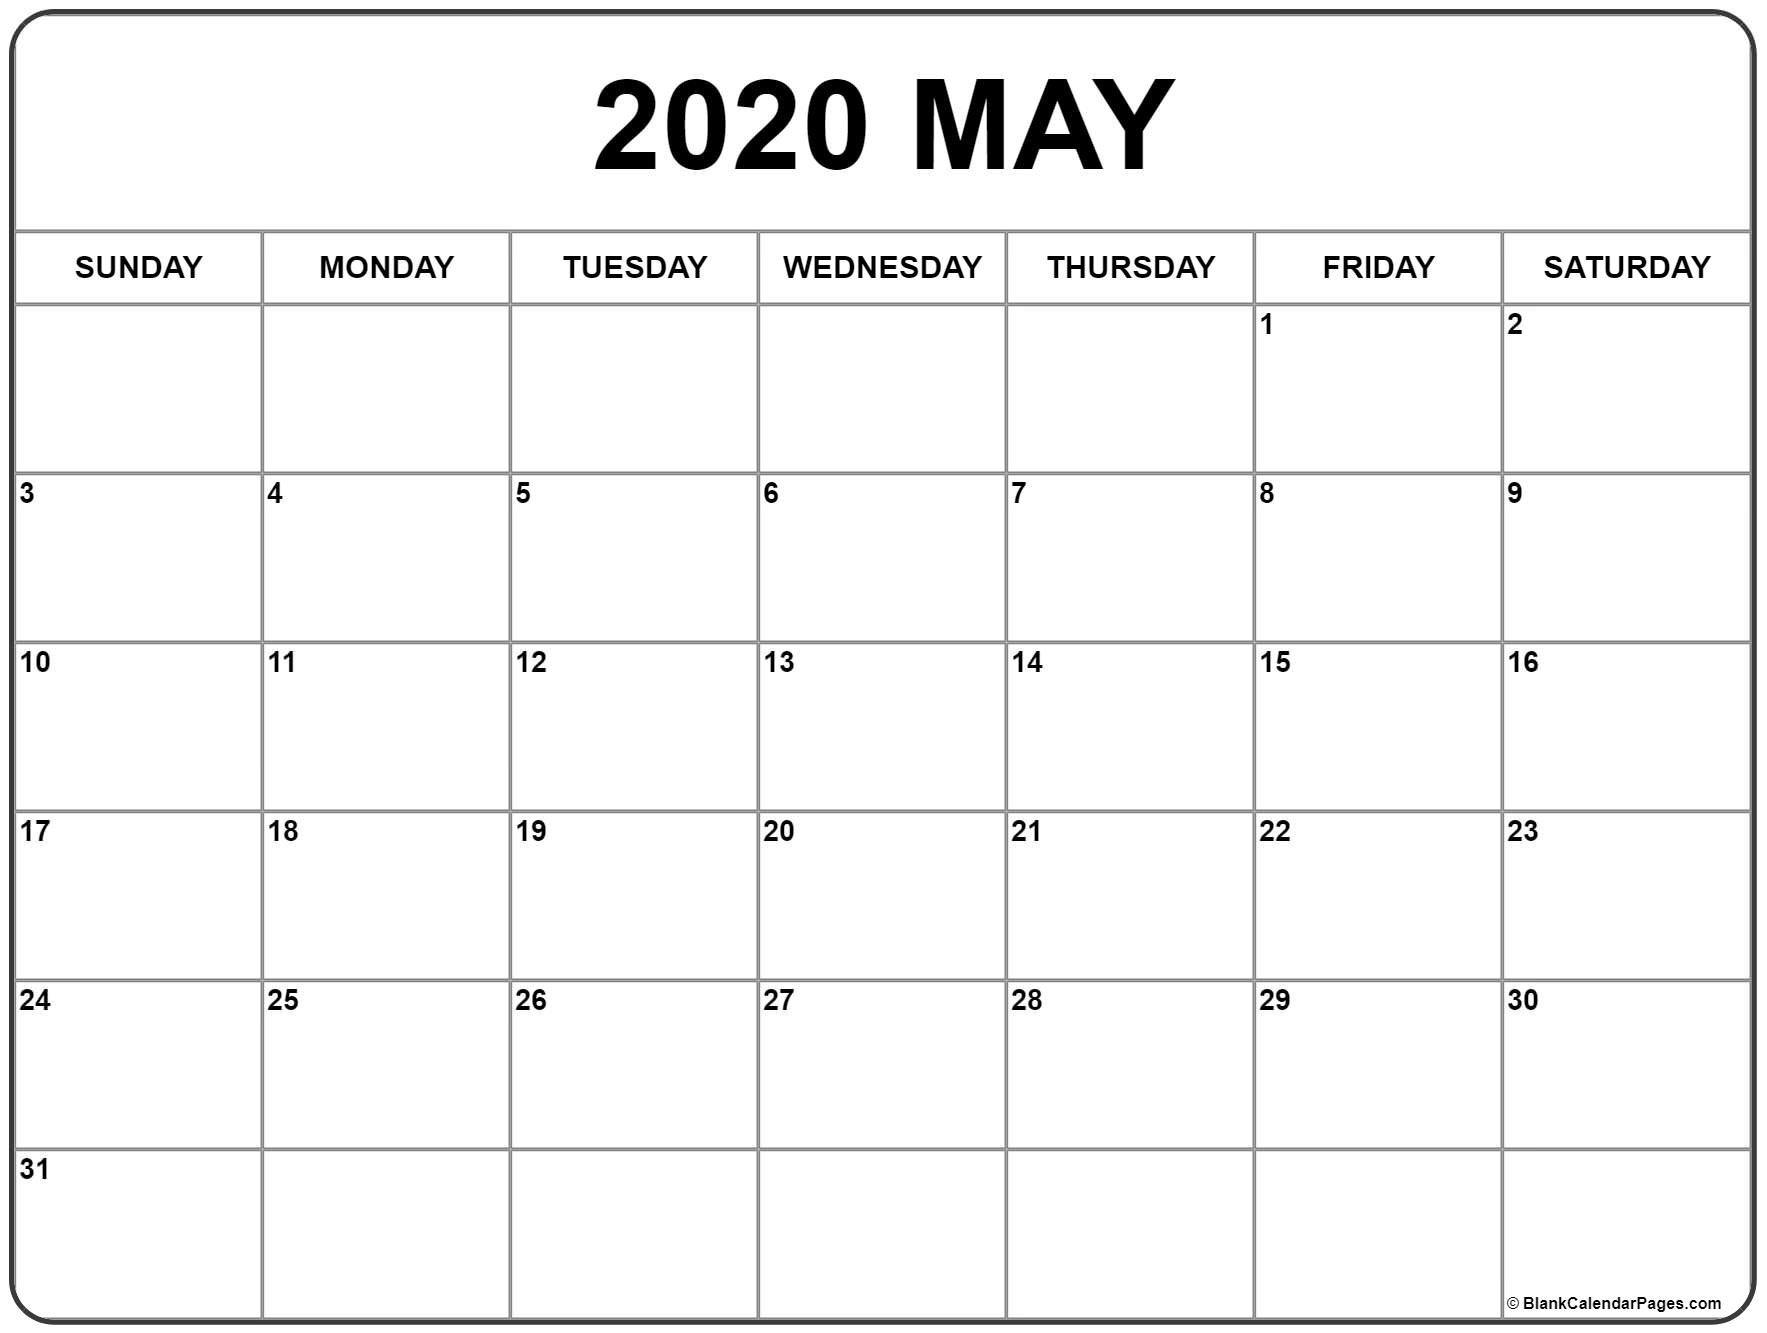 May 2020 Calendar | Free Printable Monthly Calendars Fill In Monthly Calendar Printable